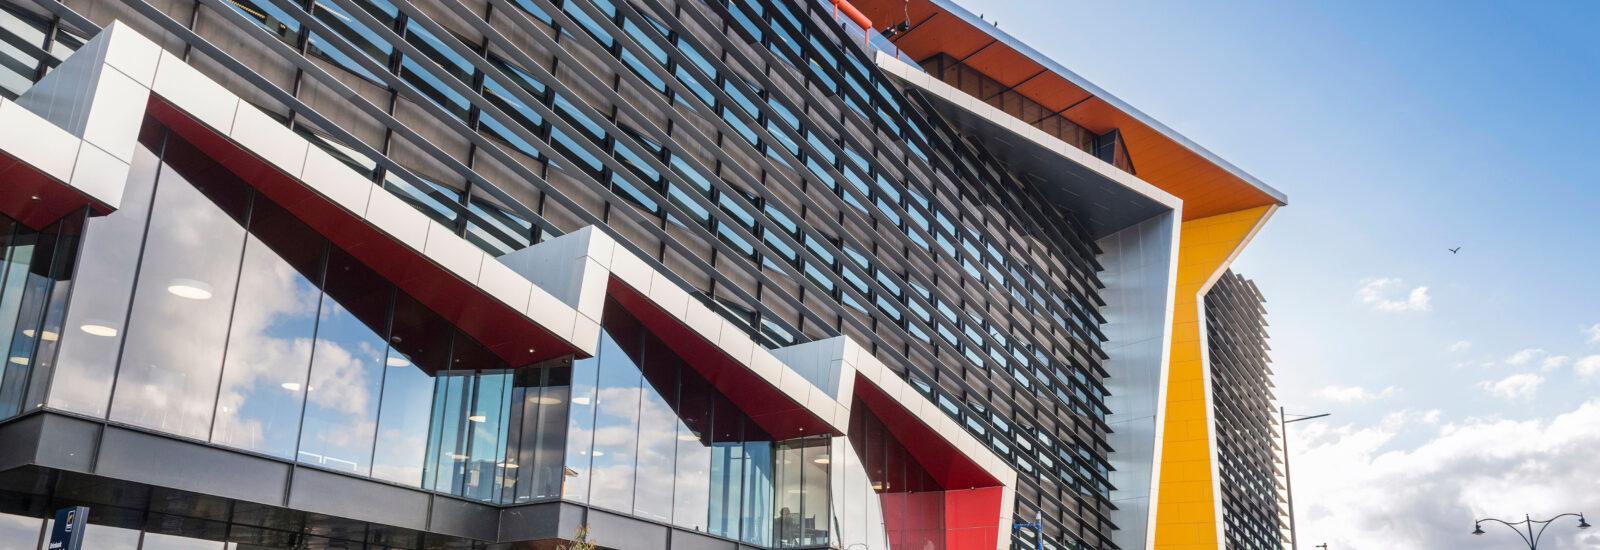 External Ventilation Louvres Architectural Screens